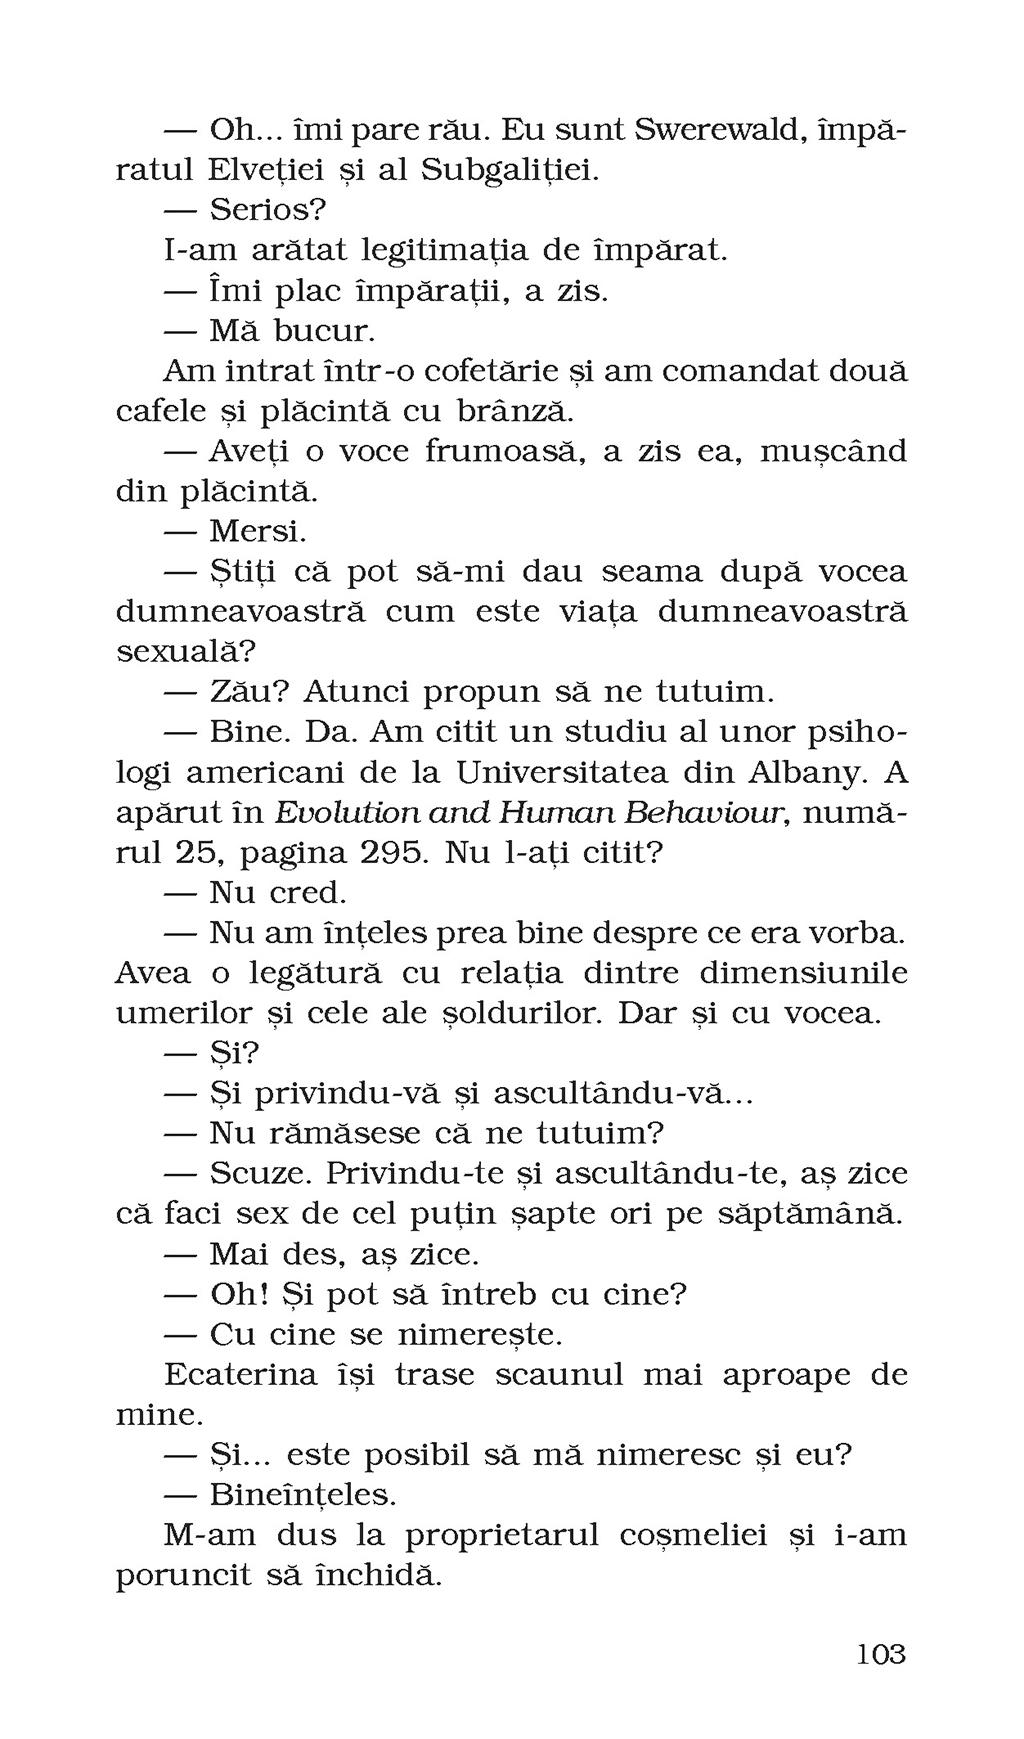 Eu et al. | Alex Tocilescu